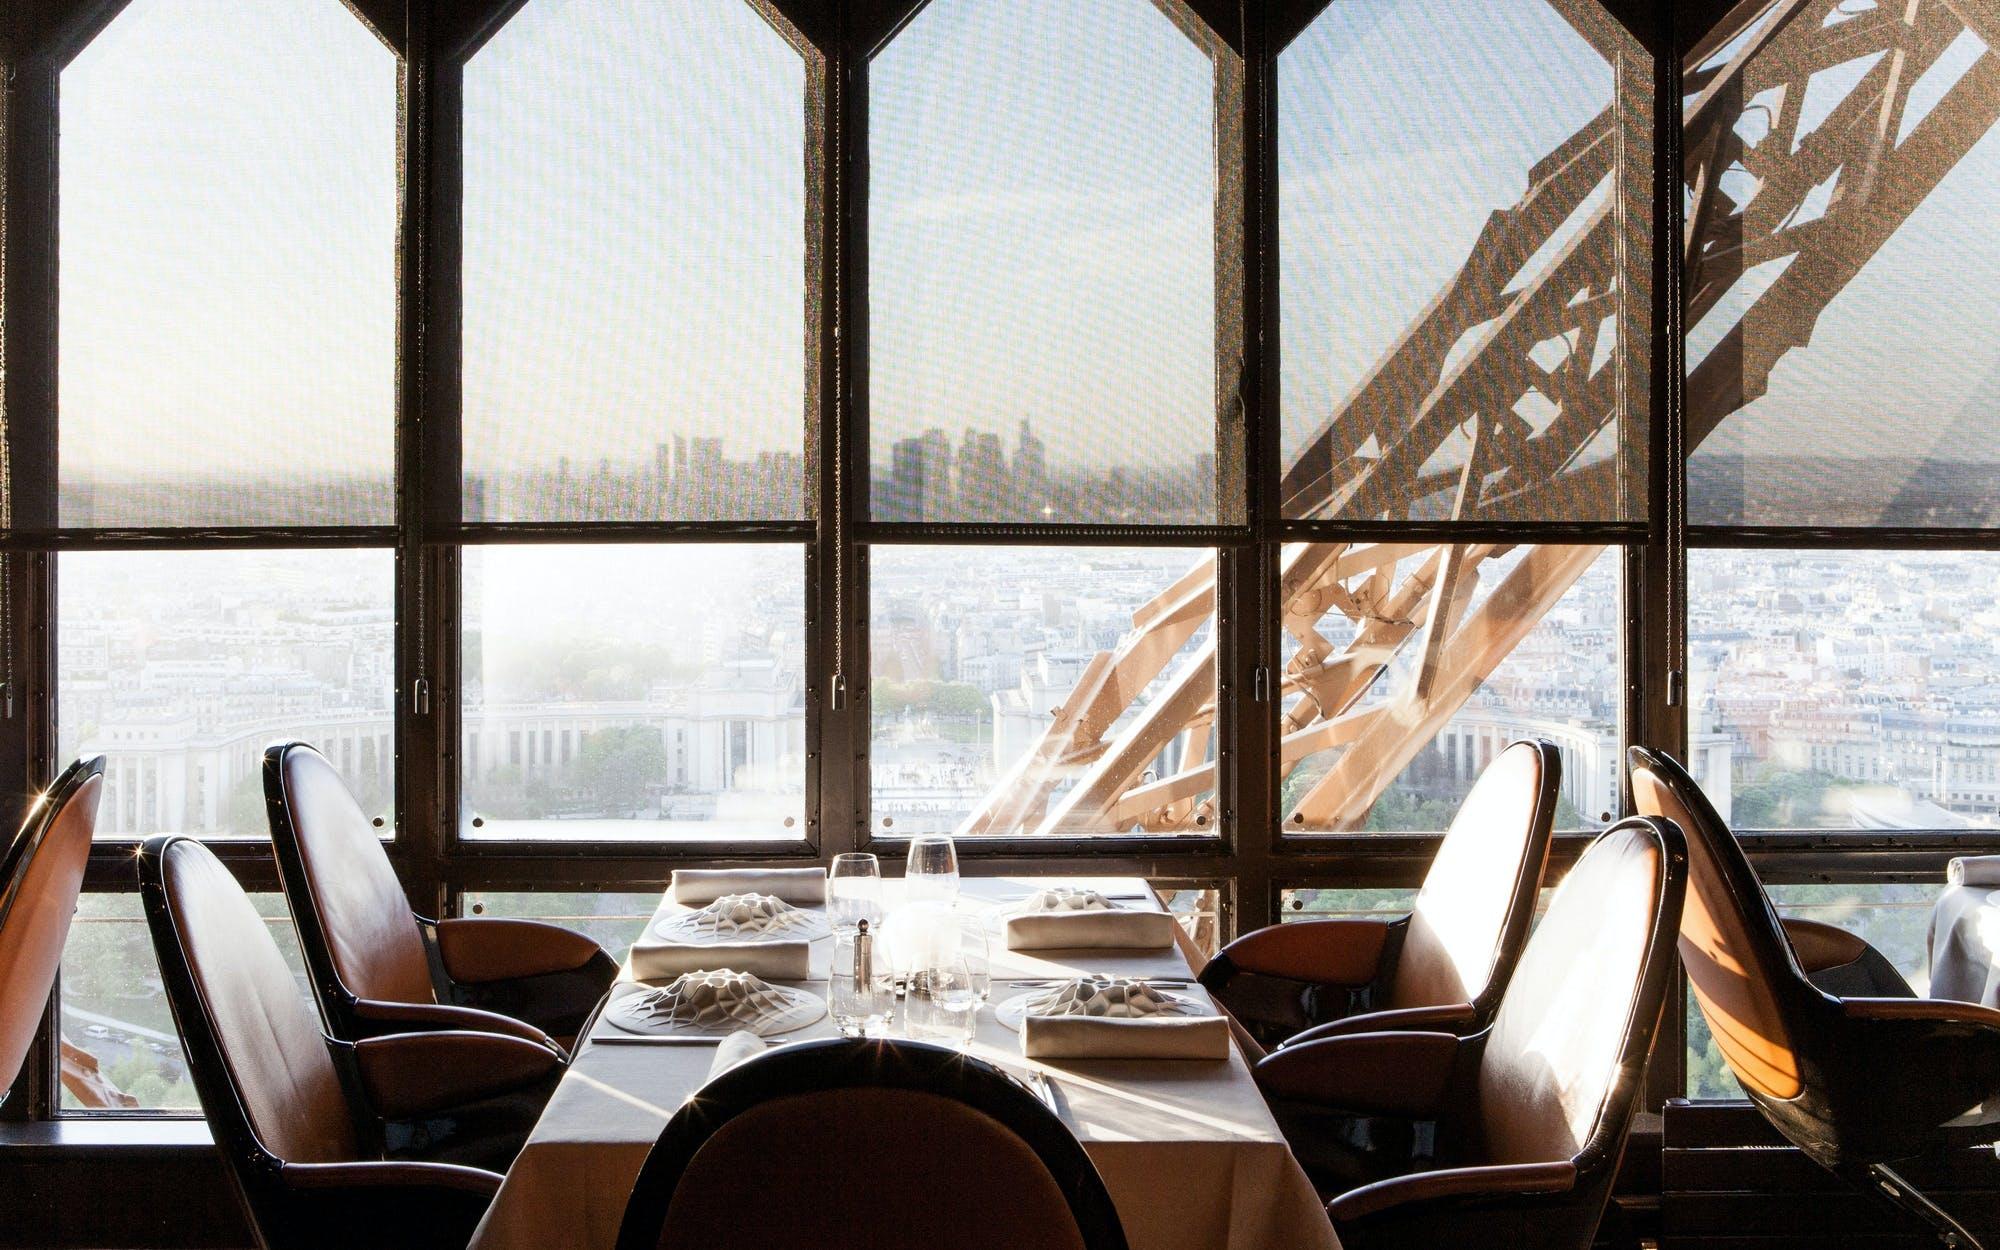 Eiffel Tower Restaurants Pros Cons Tickets Insider Tips More